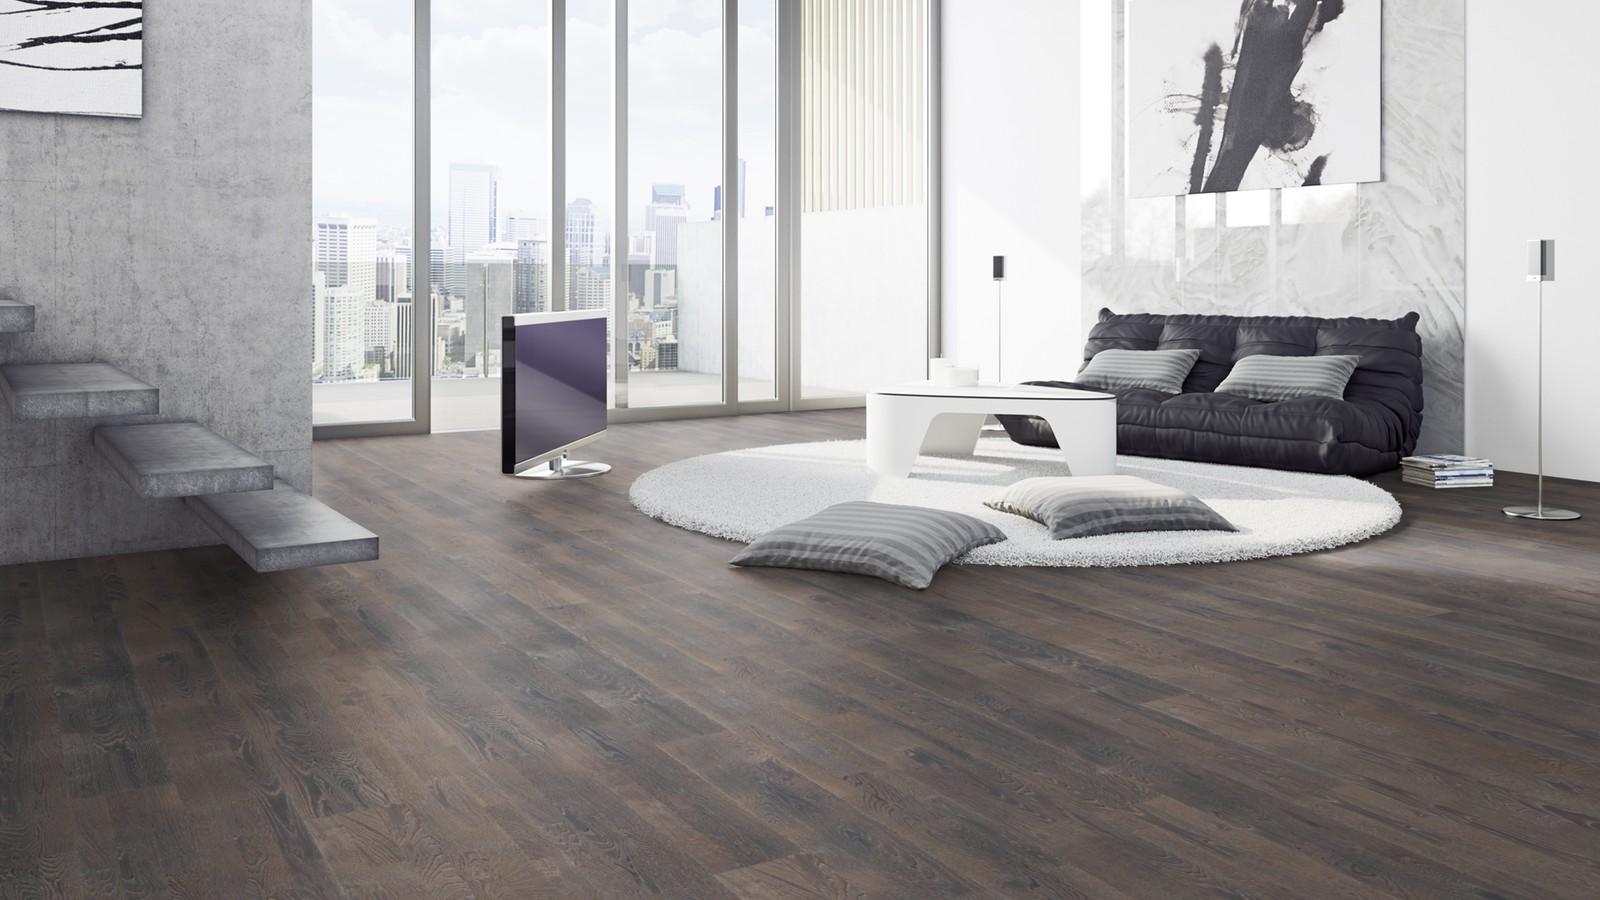 ter h rne straight collection l parkett l d08 eiche wildanthrazit l schiffsboden preisbrecher. Black Bedroom Furniture Sets. Home Design Ideas